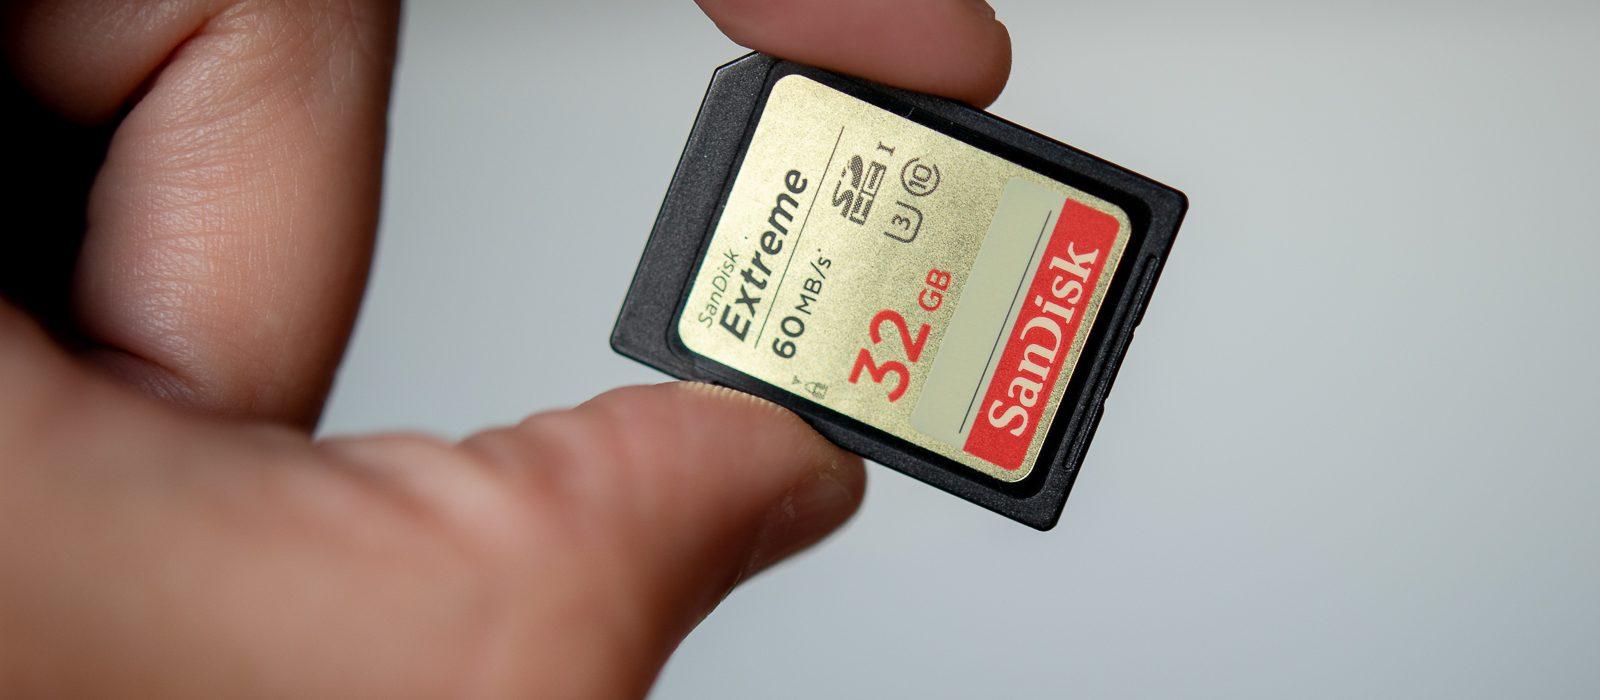 Sandisk Extreme 32GB - SD-Karte | Norbert Eder Photography